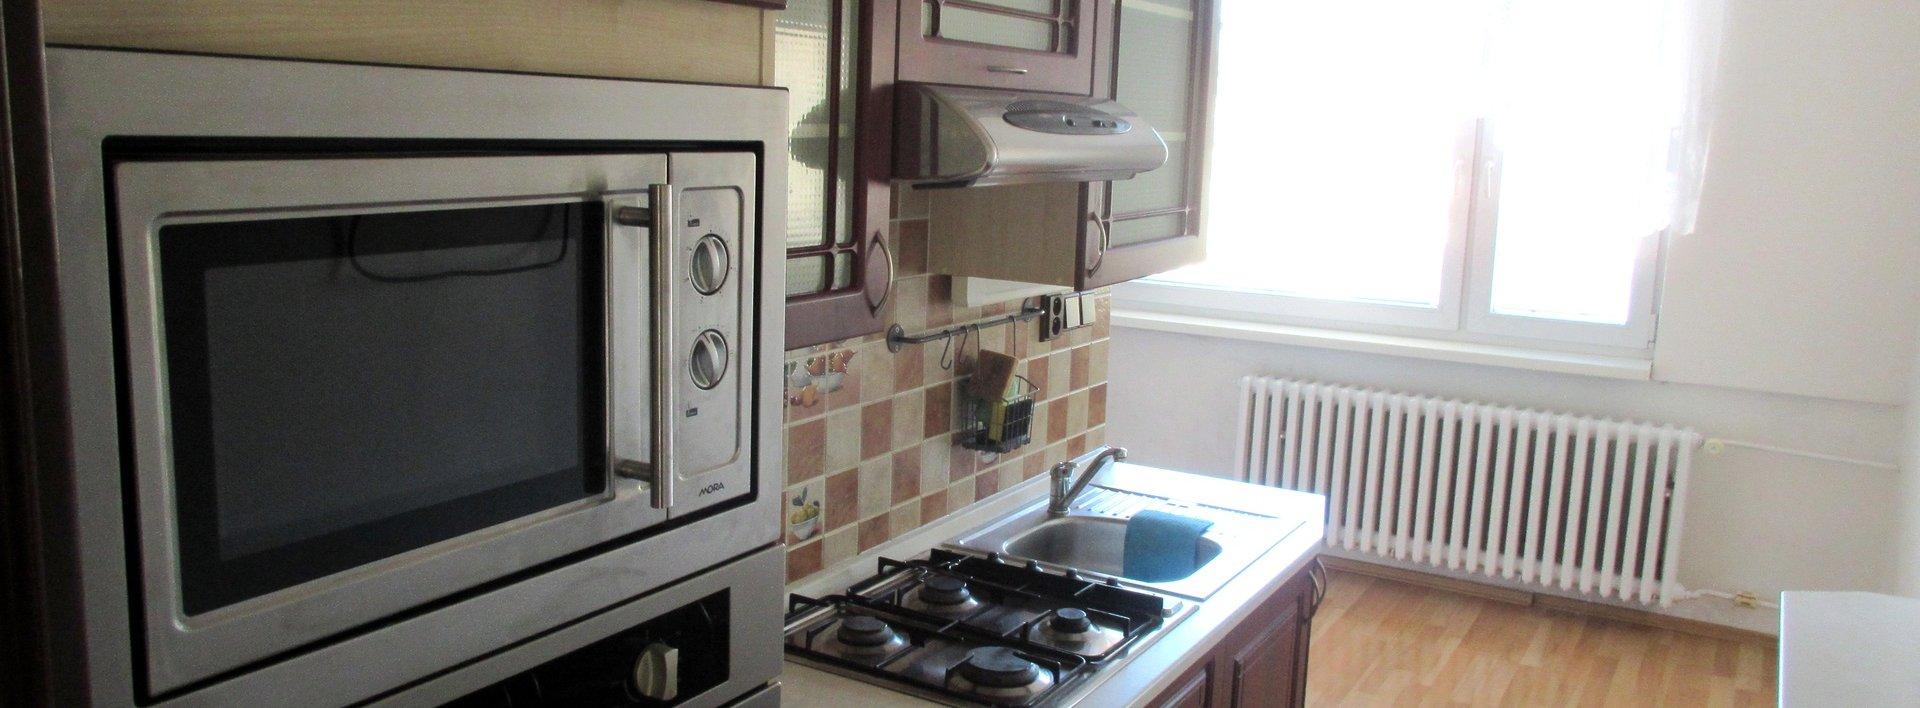 Pronájem bytu 3+1, 64 m² - Liberec IV-Perštýn, Ev.č.: N48364